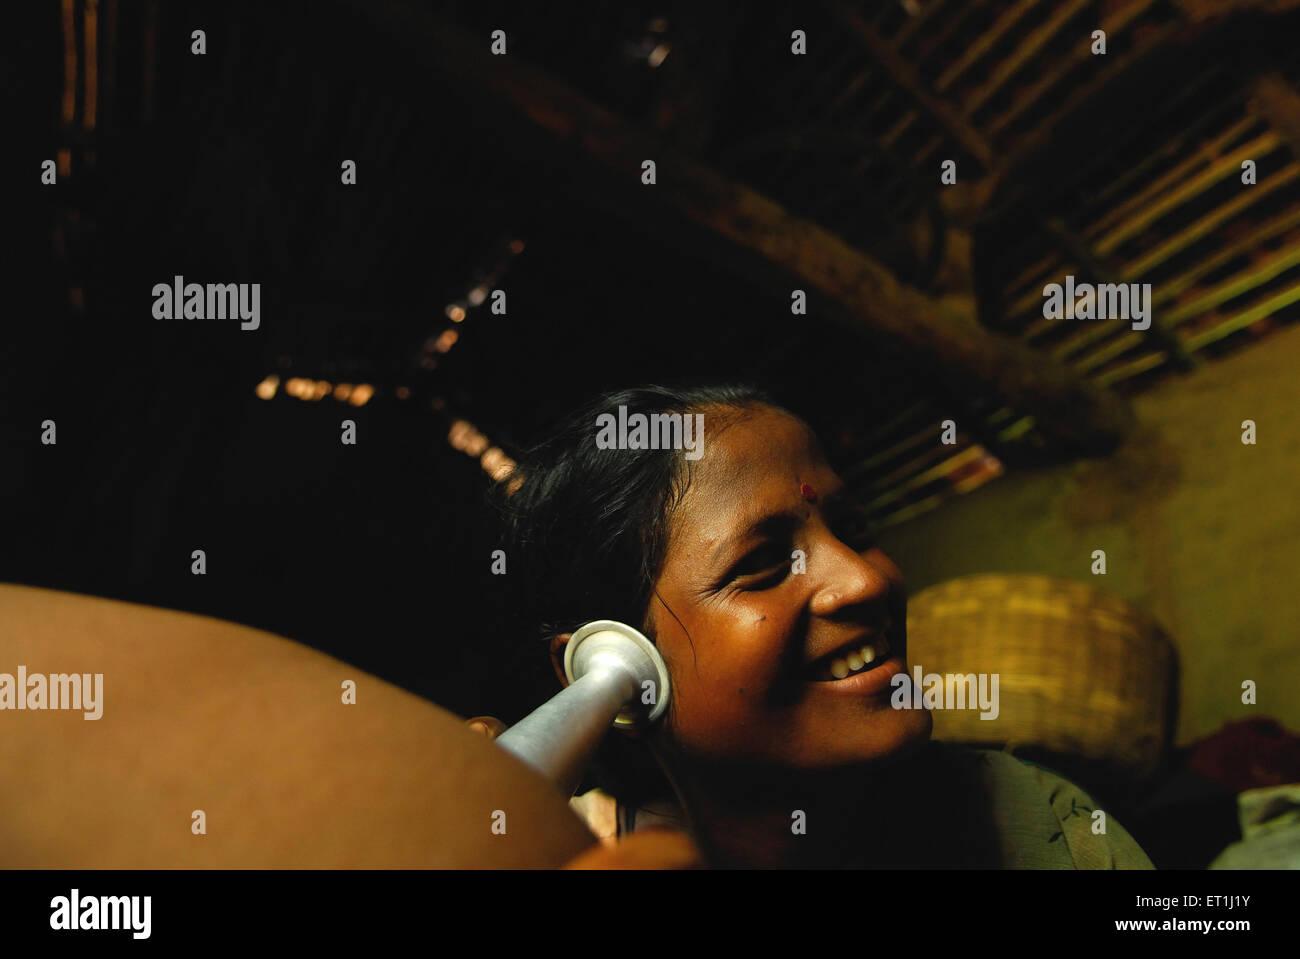 Ho tribes woman trying to listen movement of foetus ; Chakradharpur ; Jharkhand ; India NO MR - Stock Image